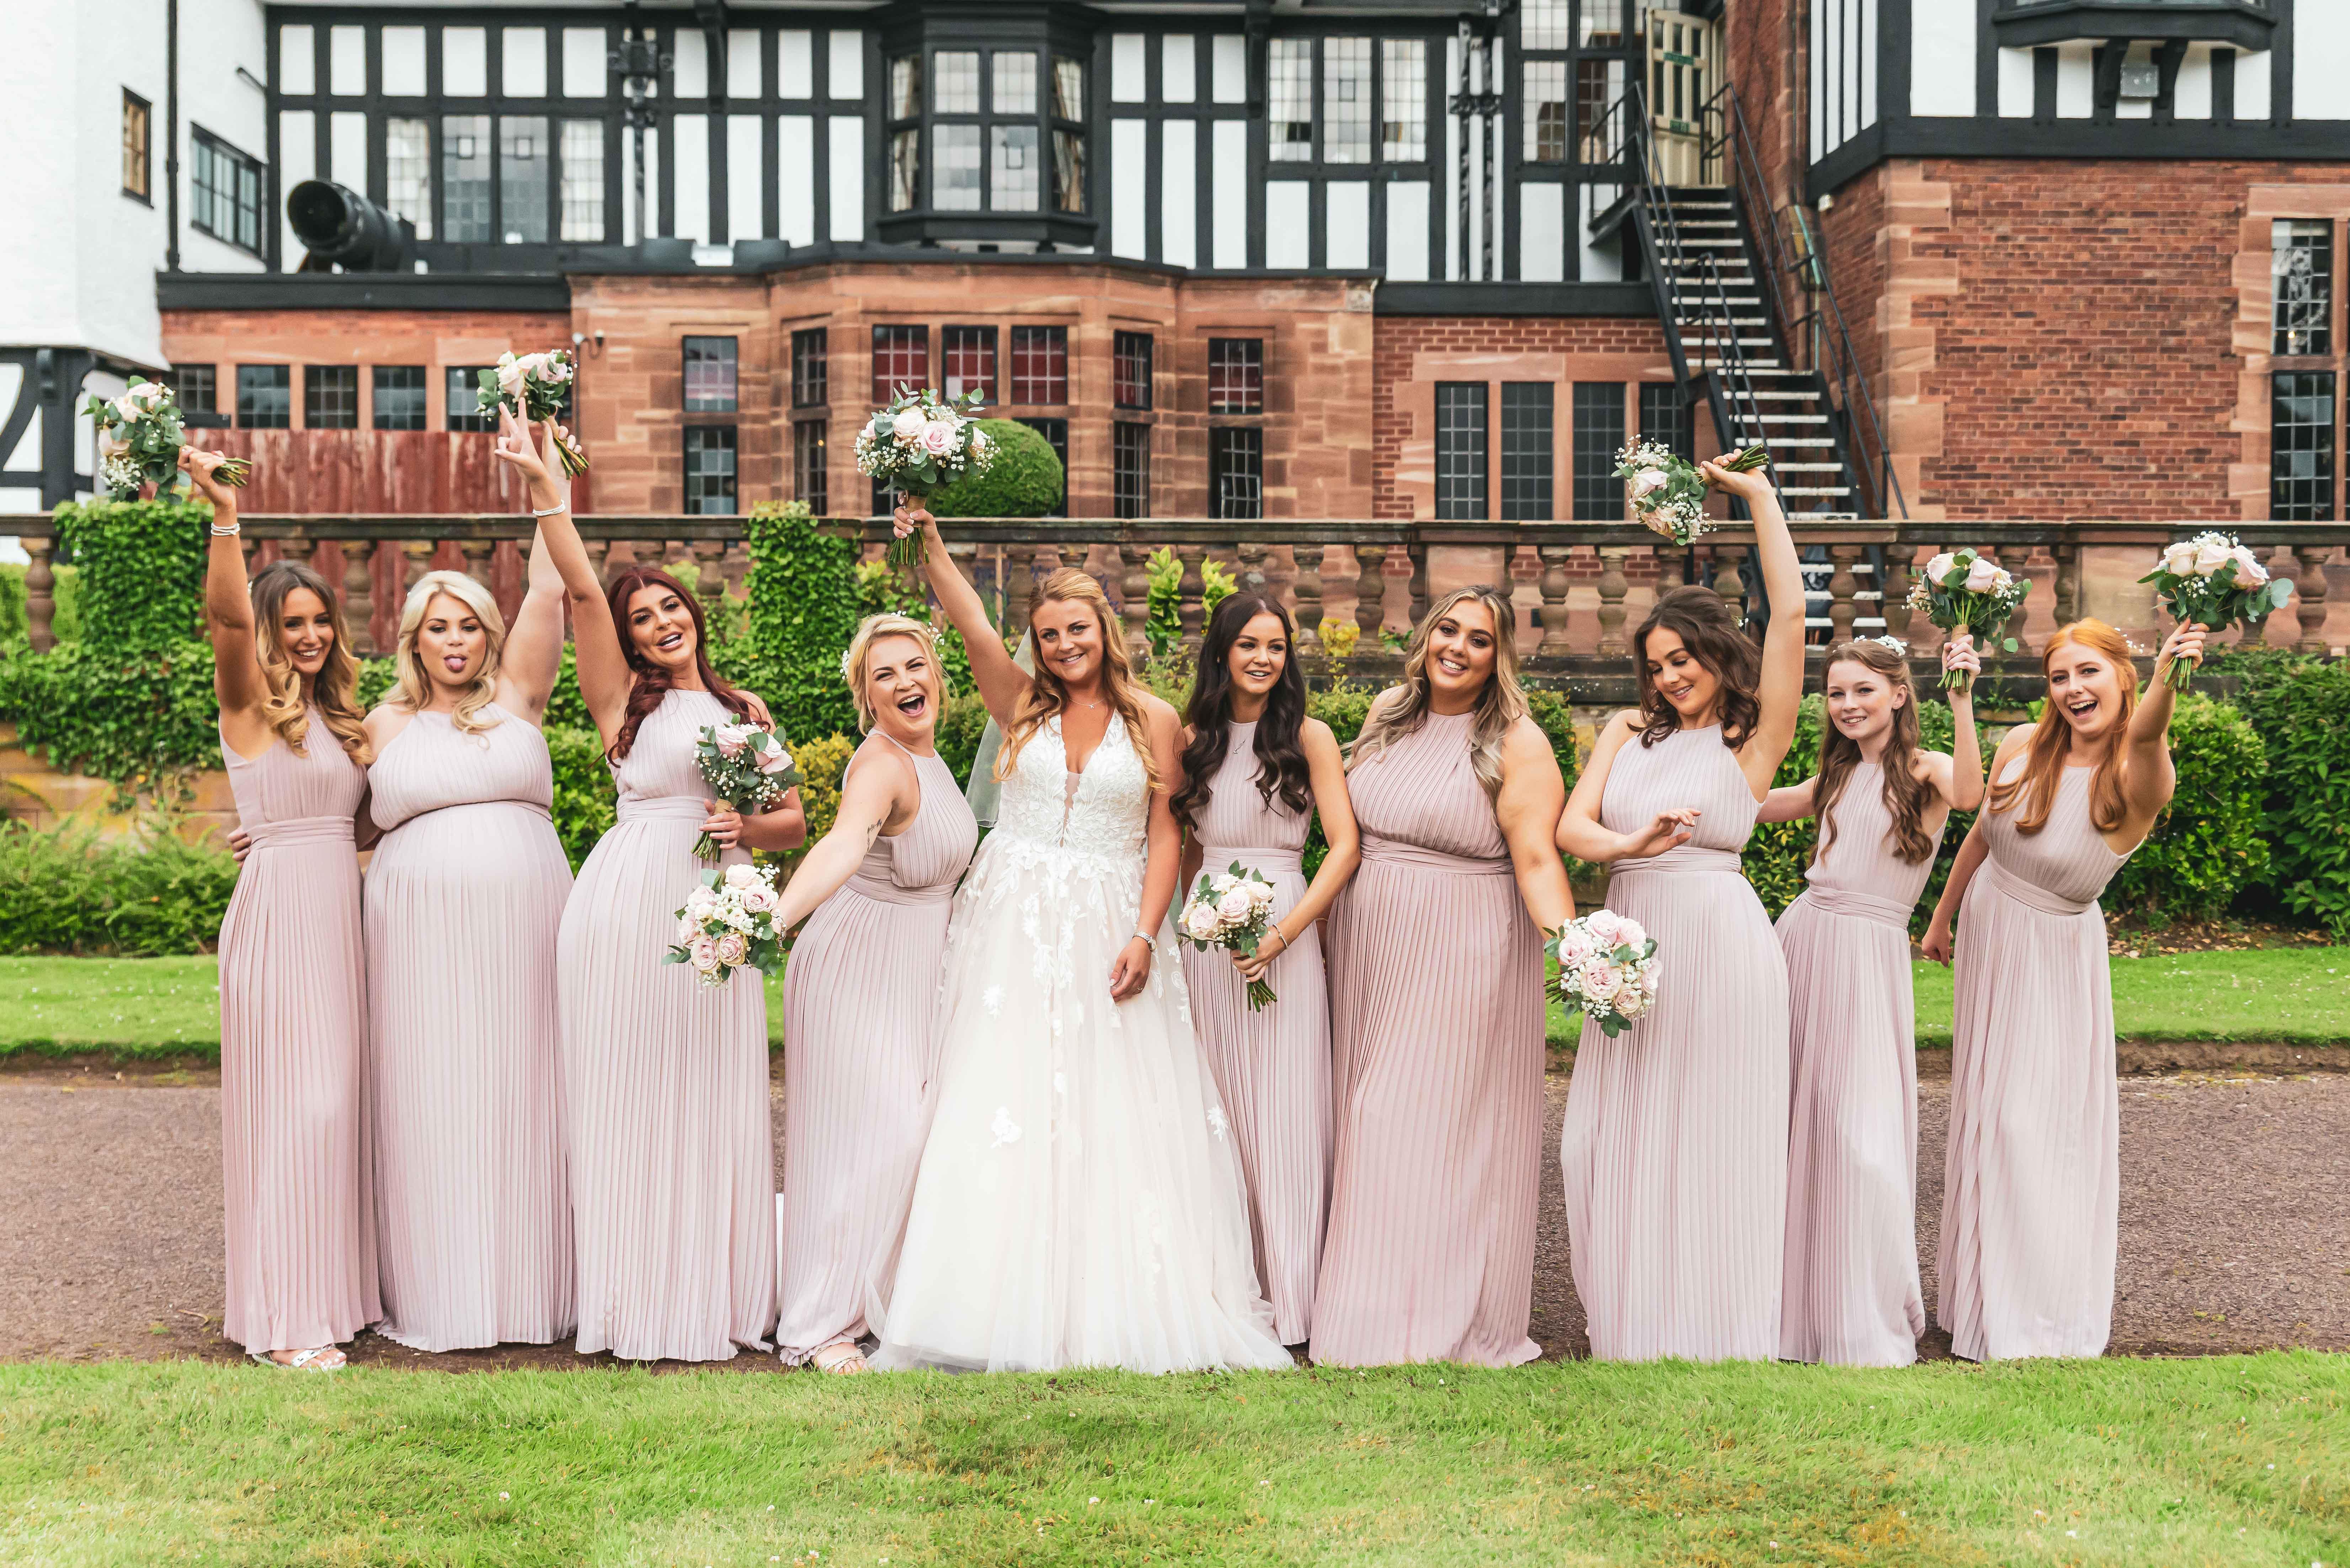 The Grosvenor Pulford wedding photography